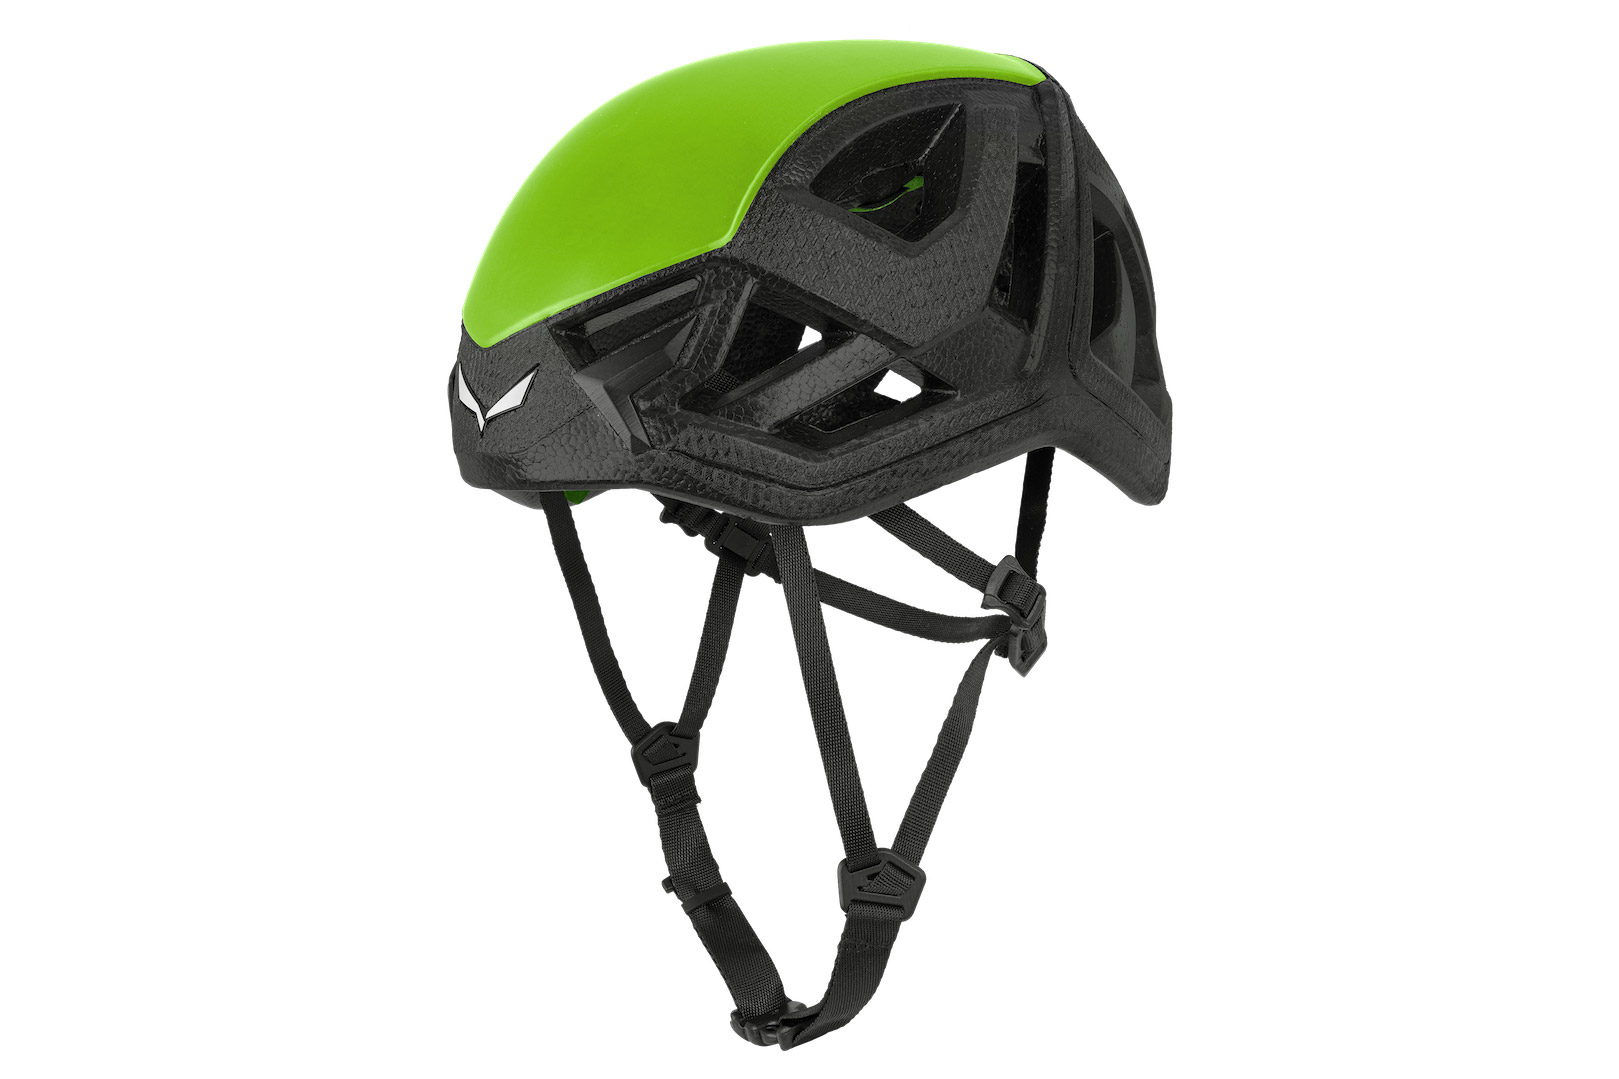 Salewa's Piuma 3.0 - multisport helmet